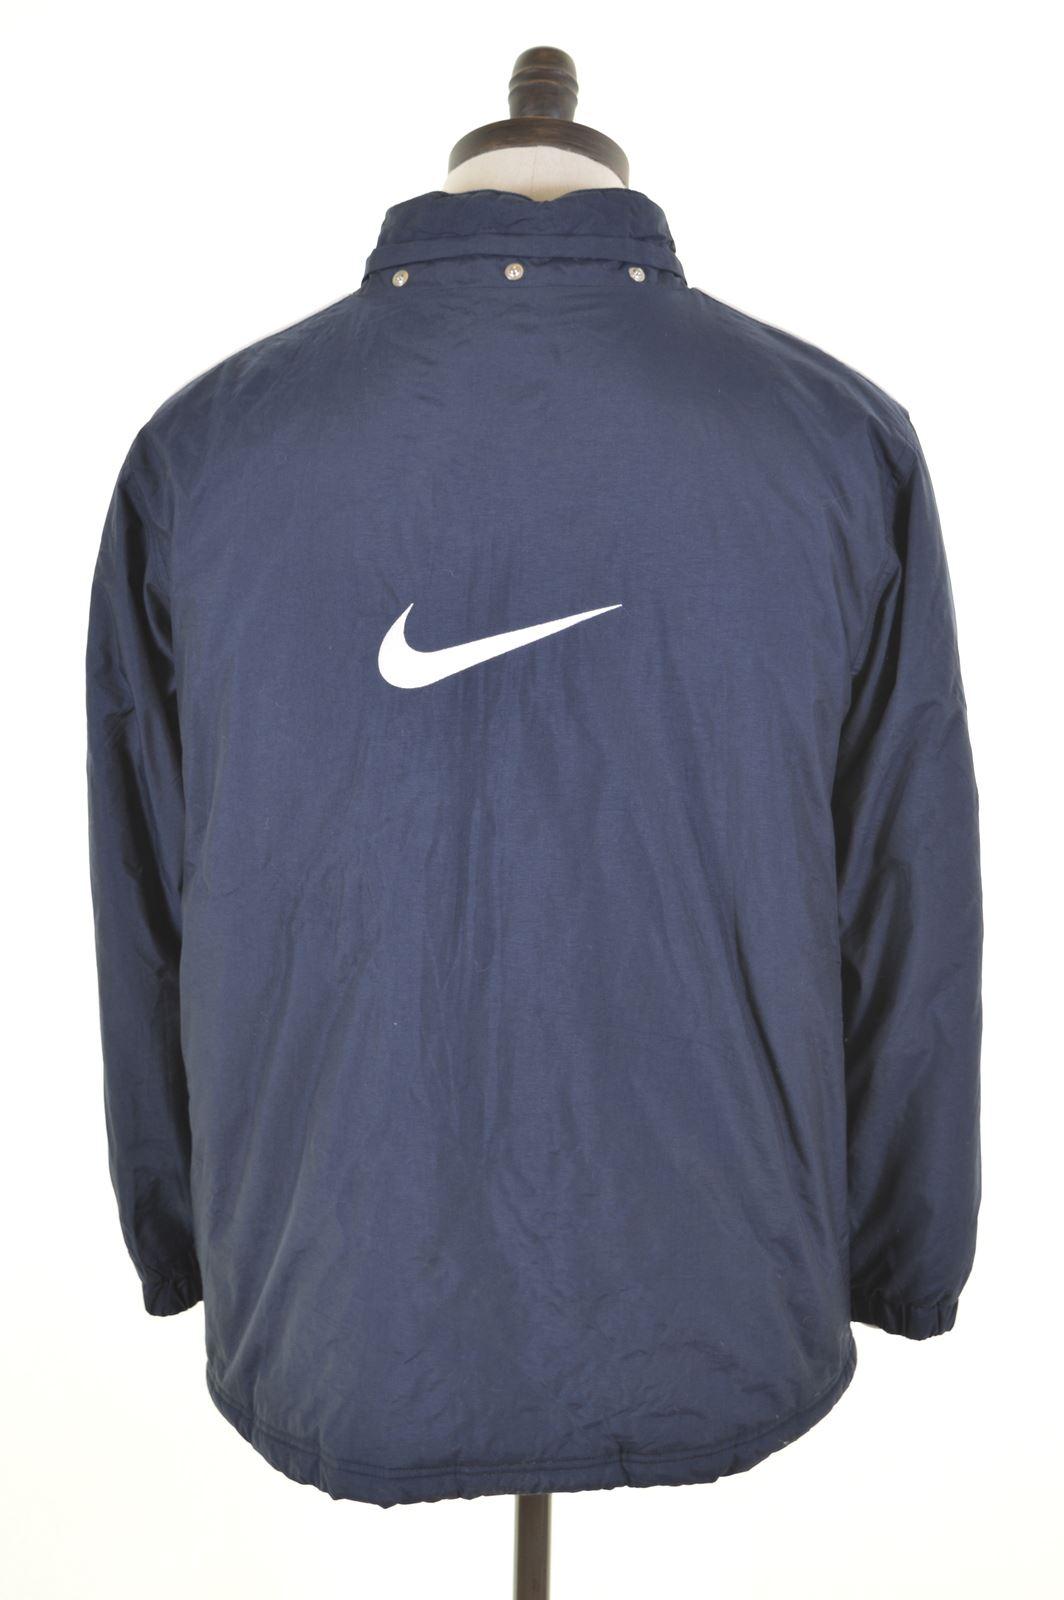 b0411d96f NIKE Boys Padded Jacket 13-14 Years XL Blue Nylon GZ05 | eBay